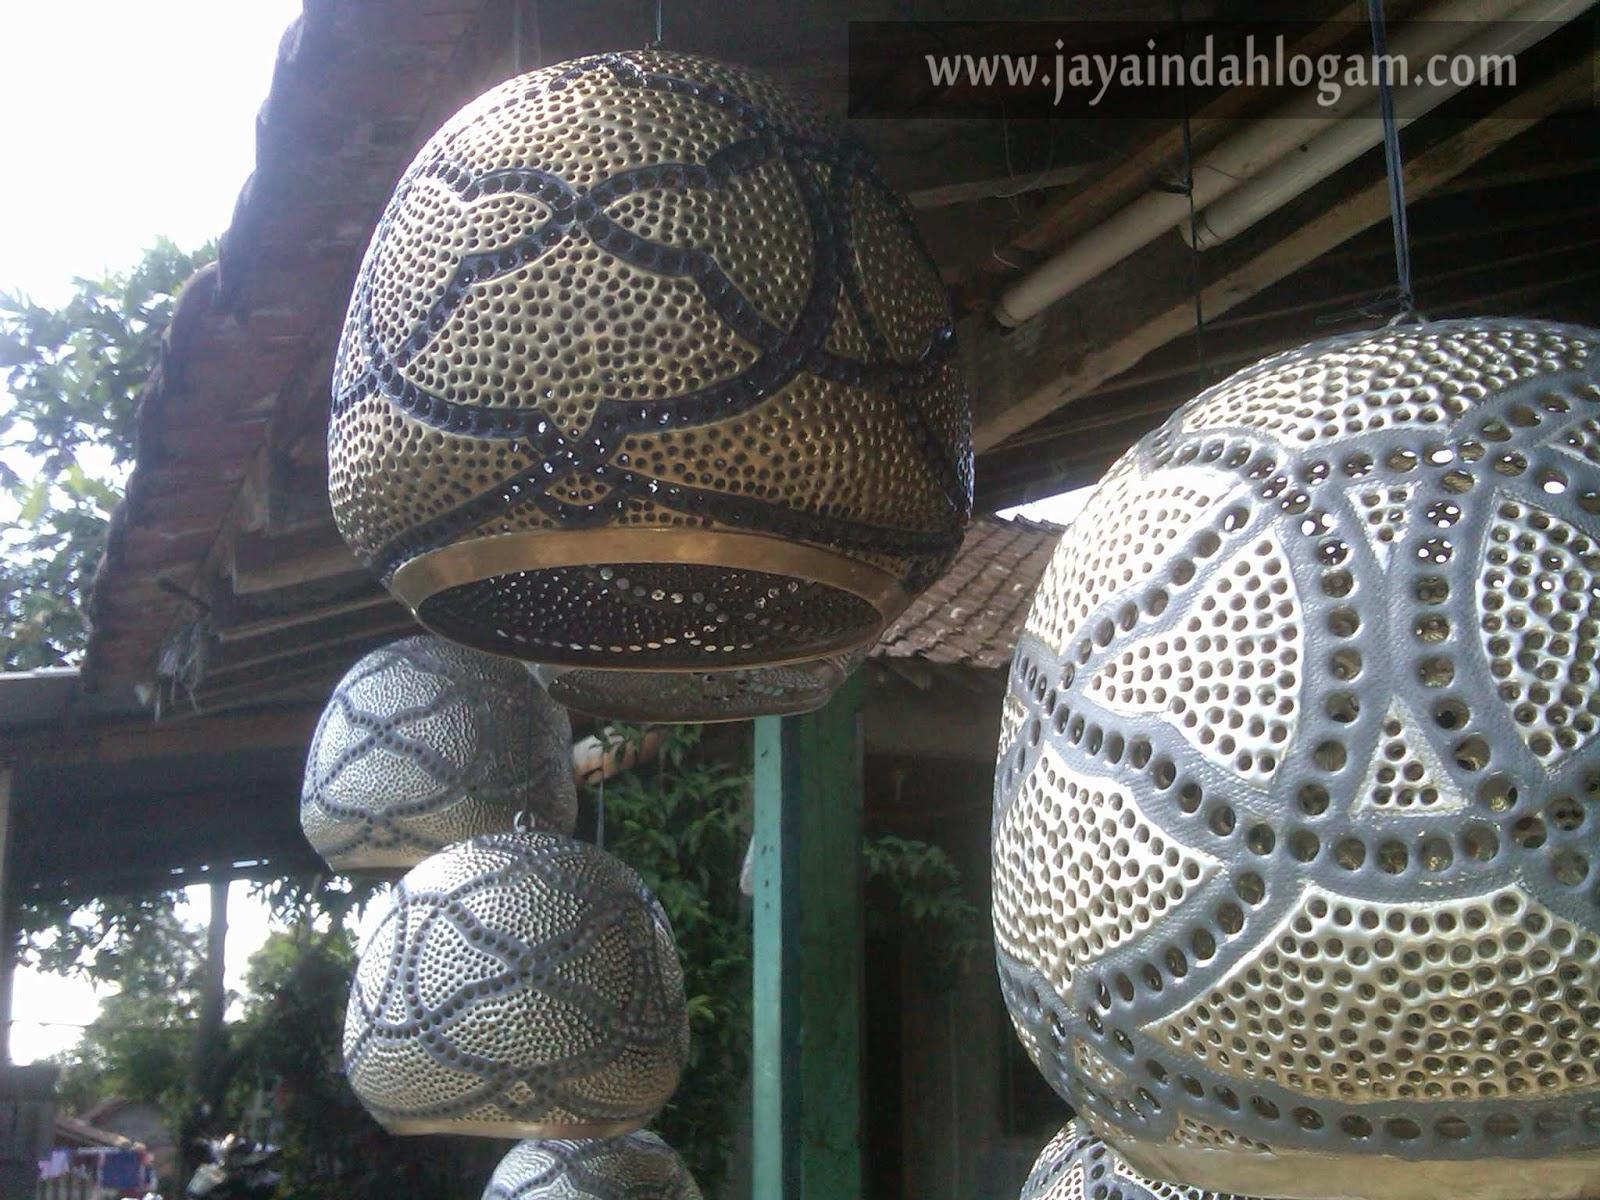 http://www.jayaindahlogam.com/2014/08/lampu-gantung-kuningan.html